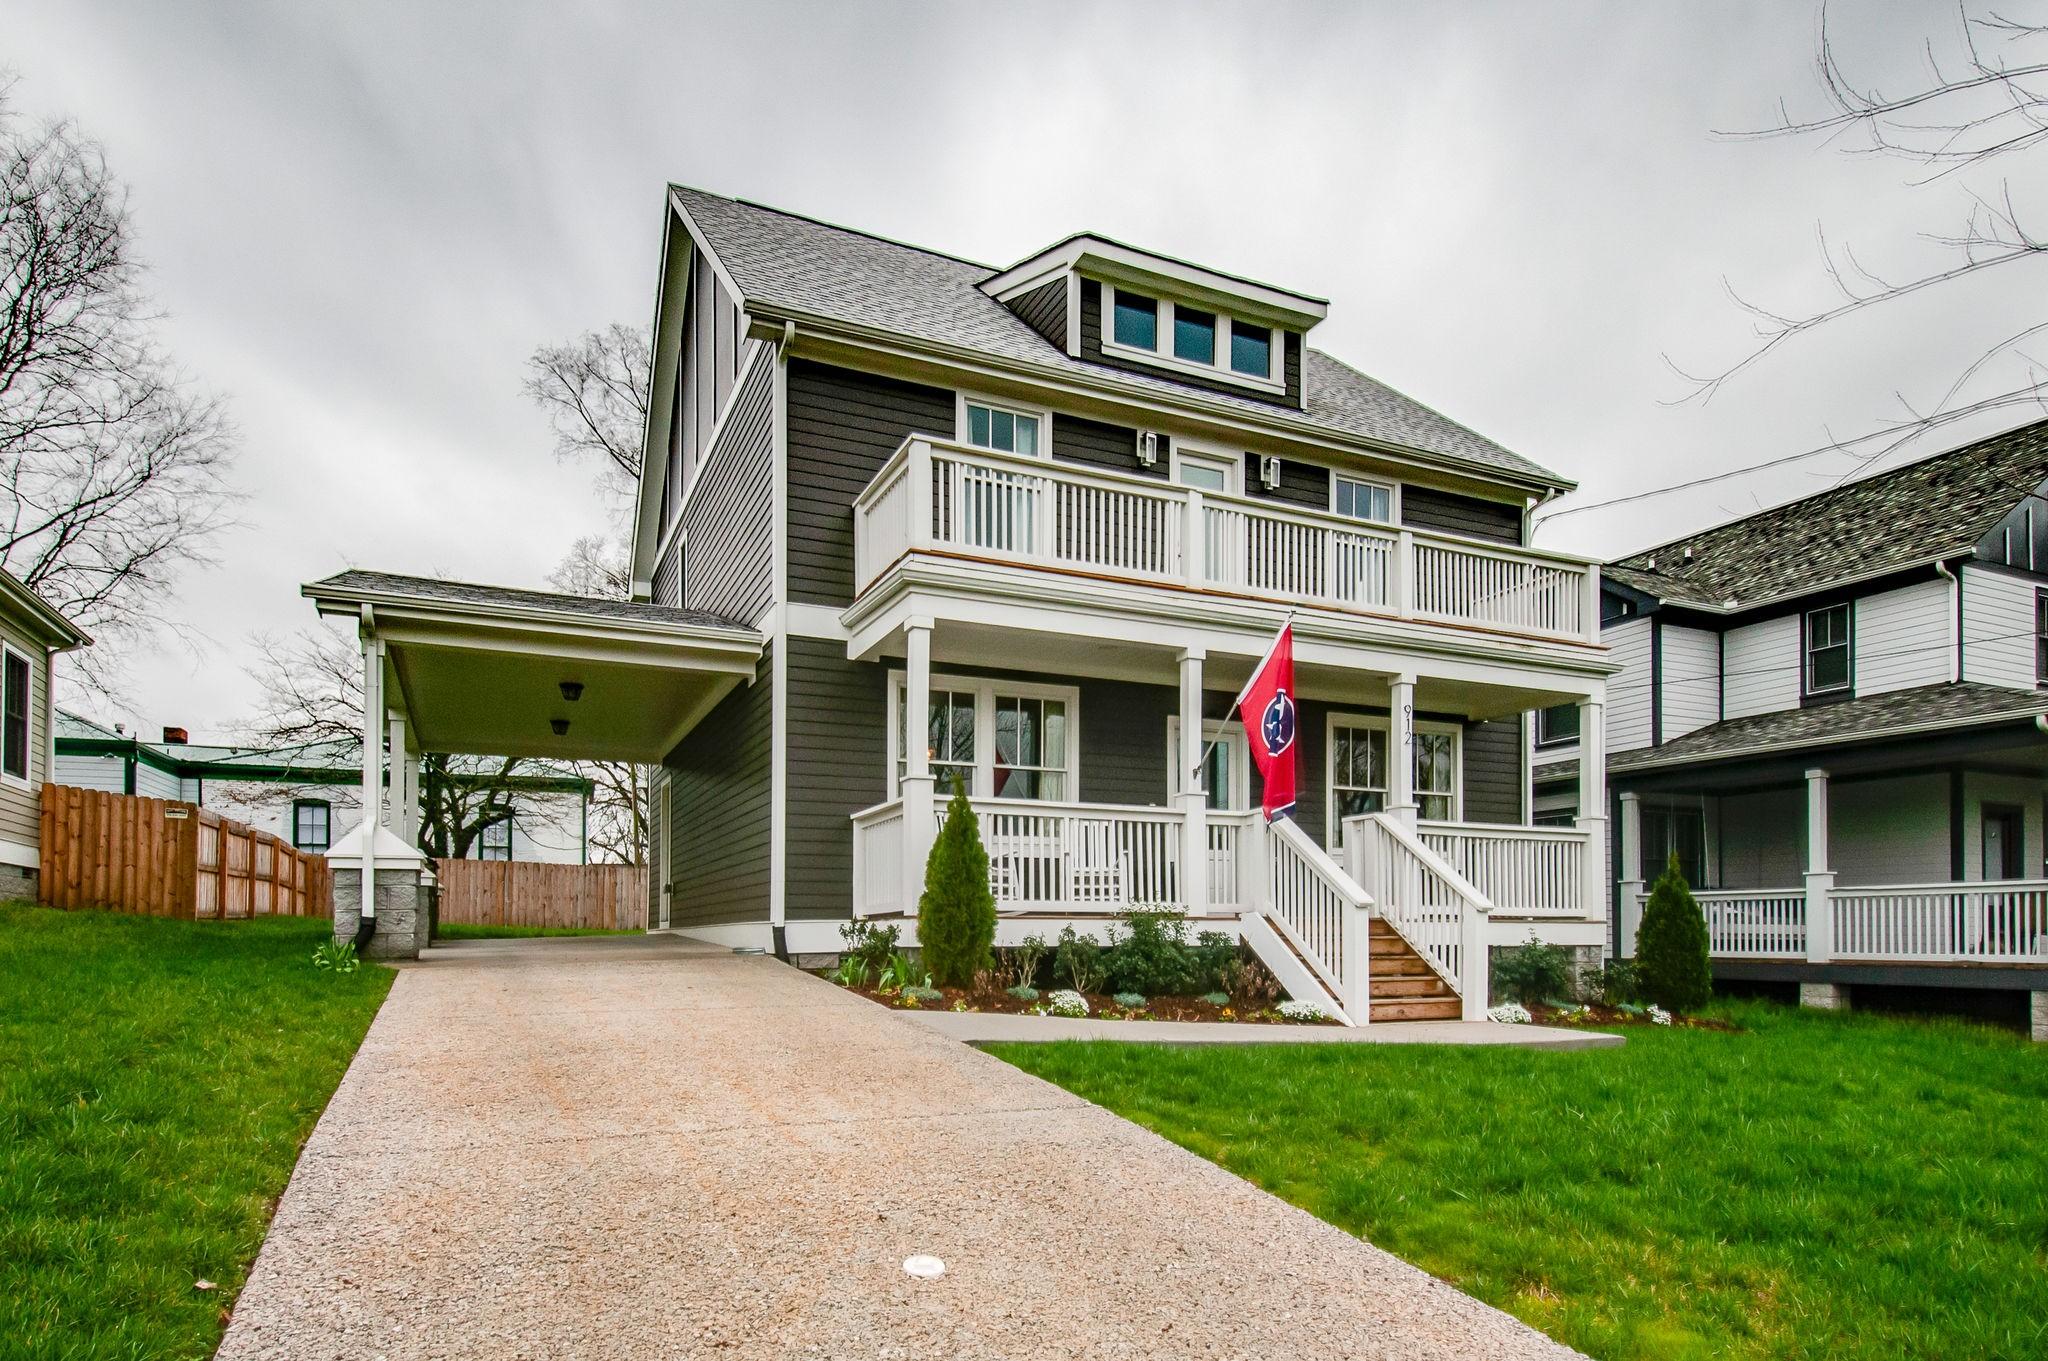 912 Granada Ave, Nashville, TN 37206 - Nashville, TN real estate listing